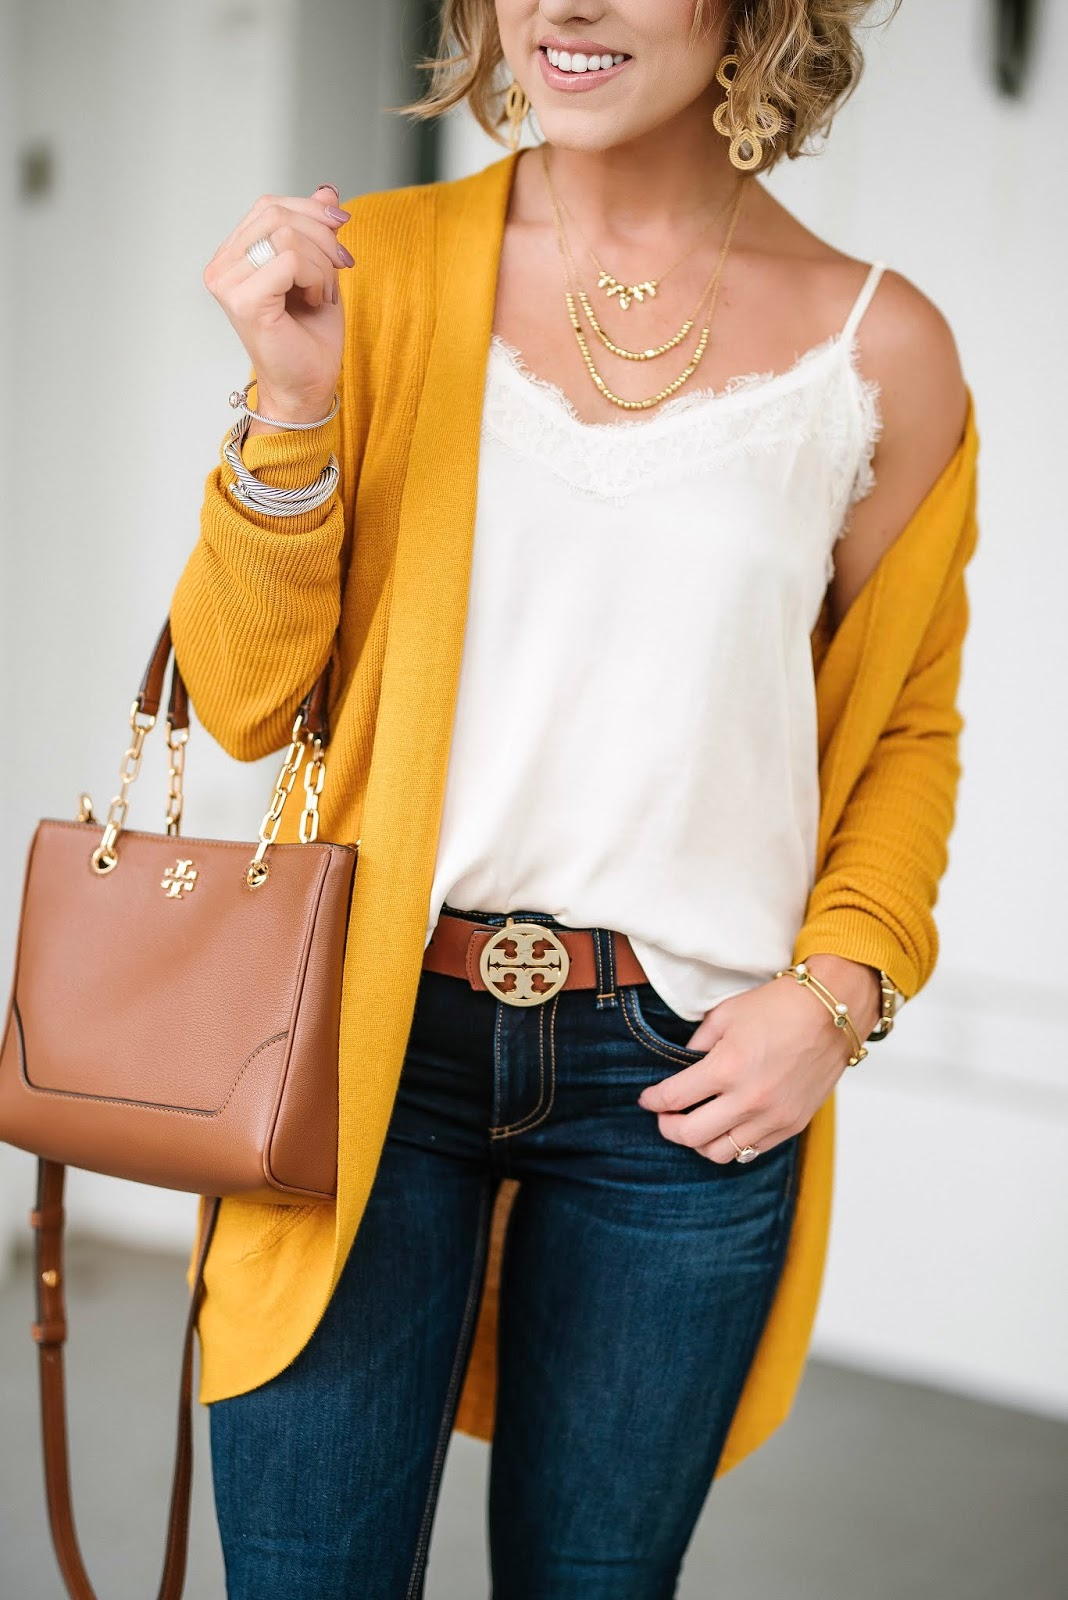 Under $30 Mustard Yellow Cardigan - Target Style! - Something Delightful Blog @racheltimmerman